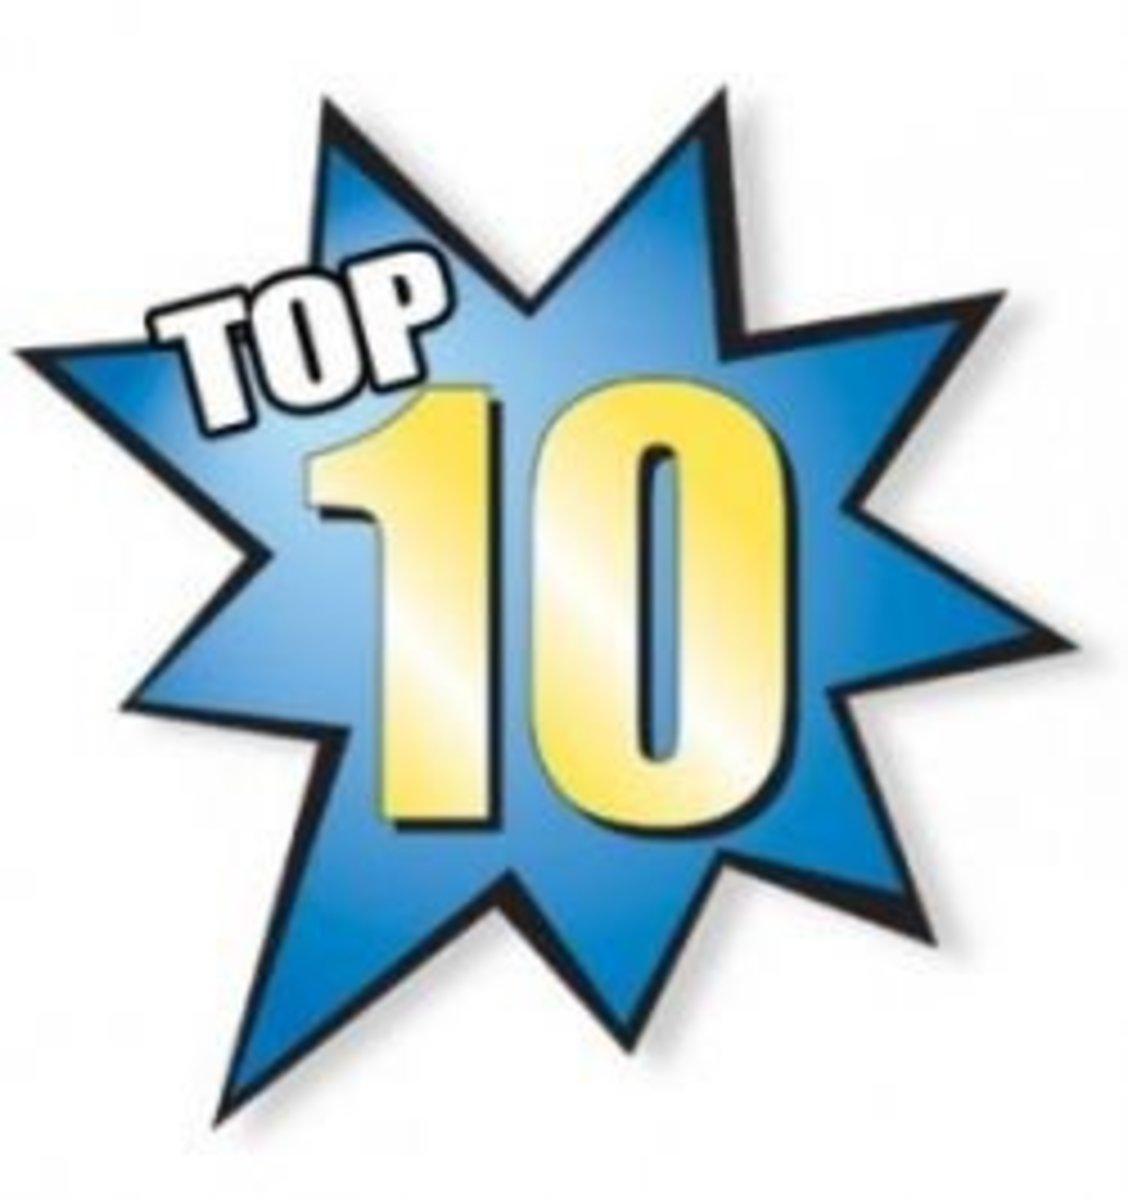 Top 10 Yugioh Cards